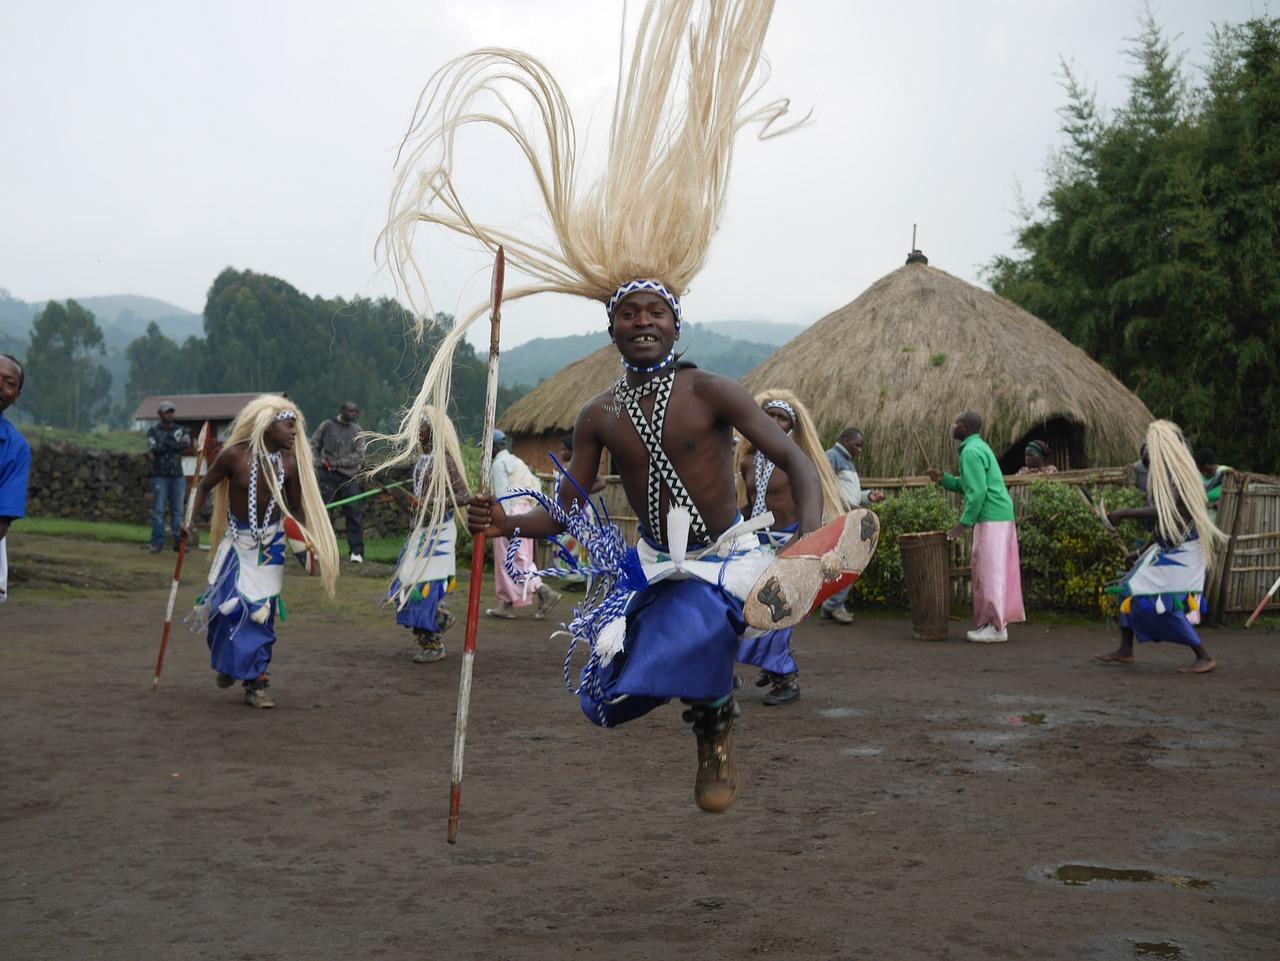 Poverty figures in Rwanda 'manipulated'